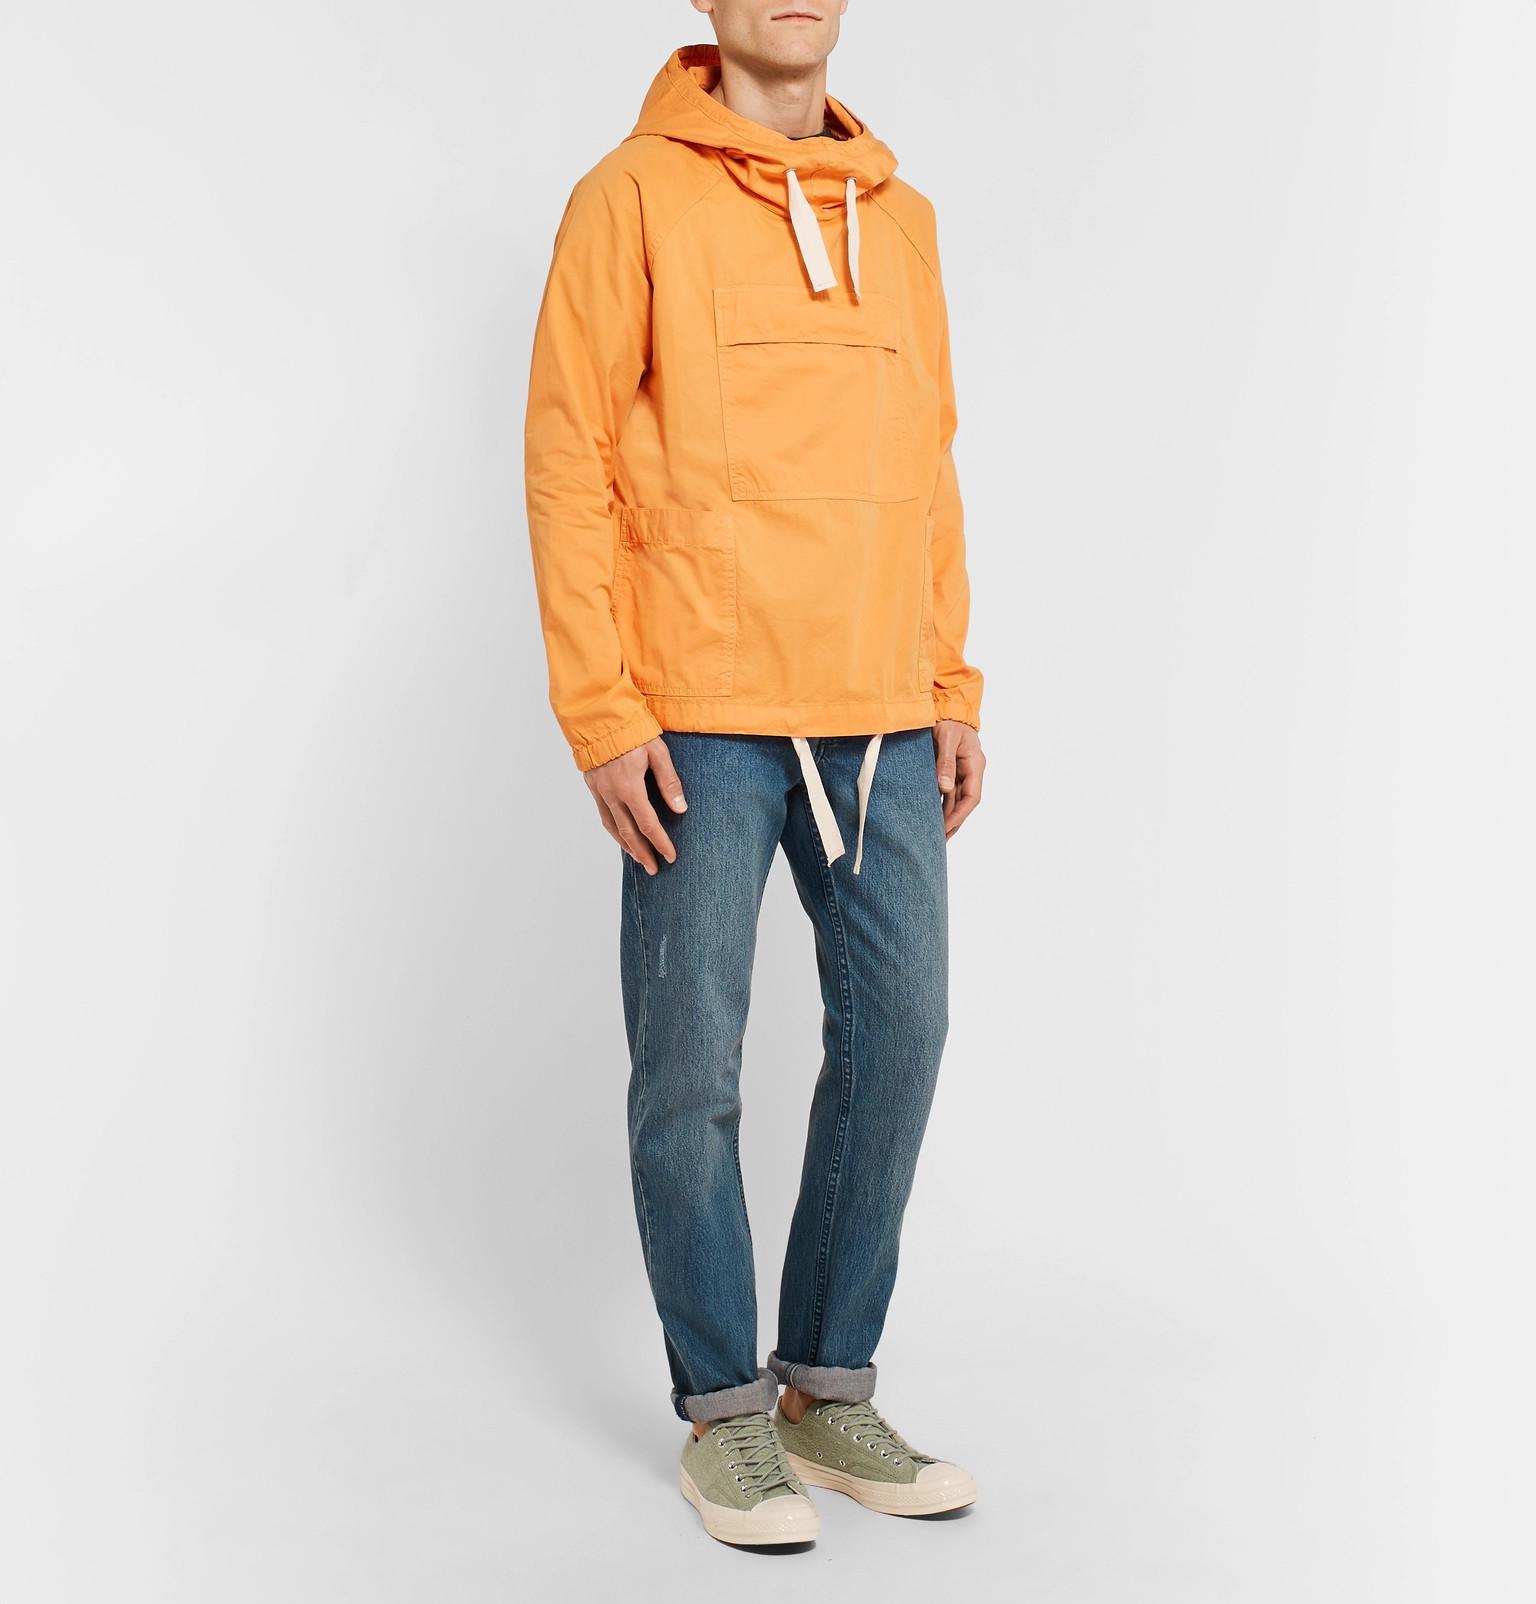 Jacket Hooded Orange Cotton Twill View Fullscreen Men Lyst Sailing Smock Albam For HgYfwRqw